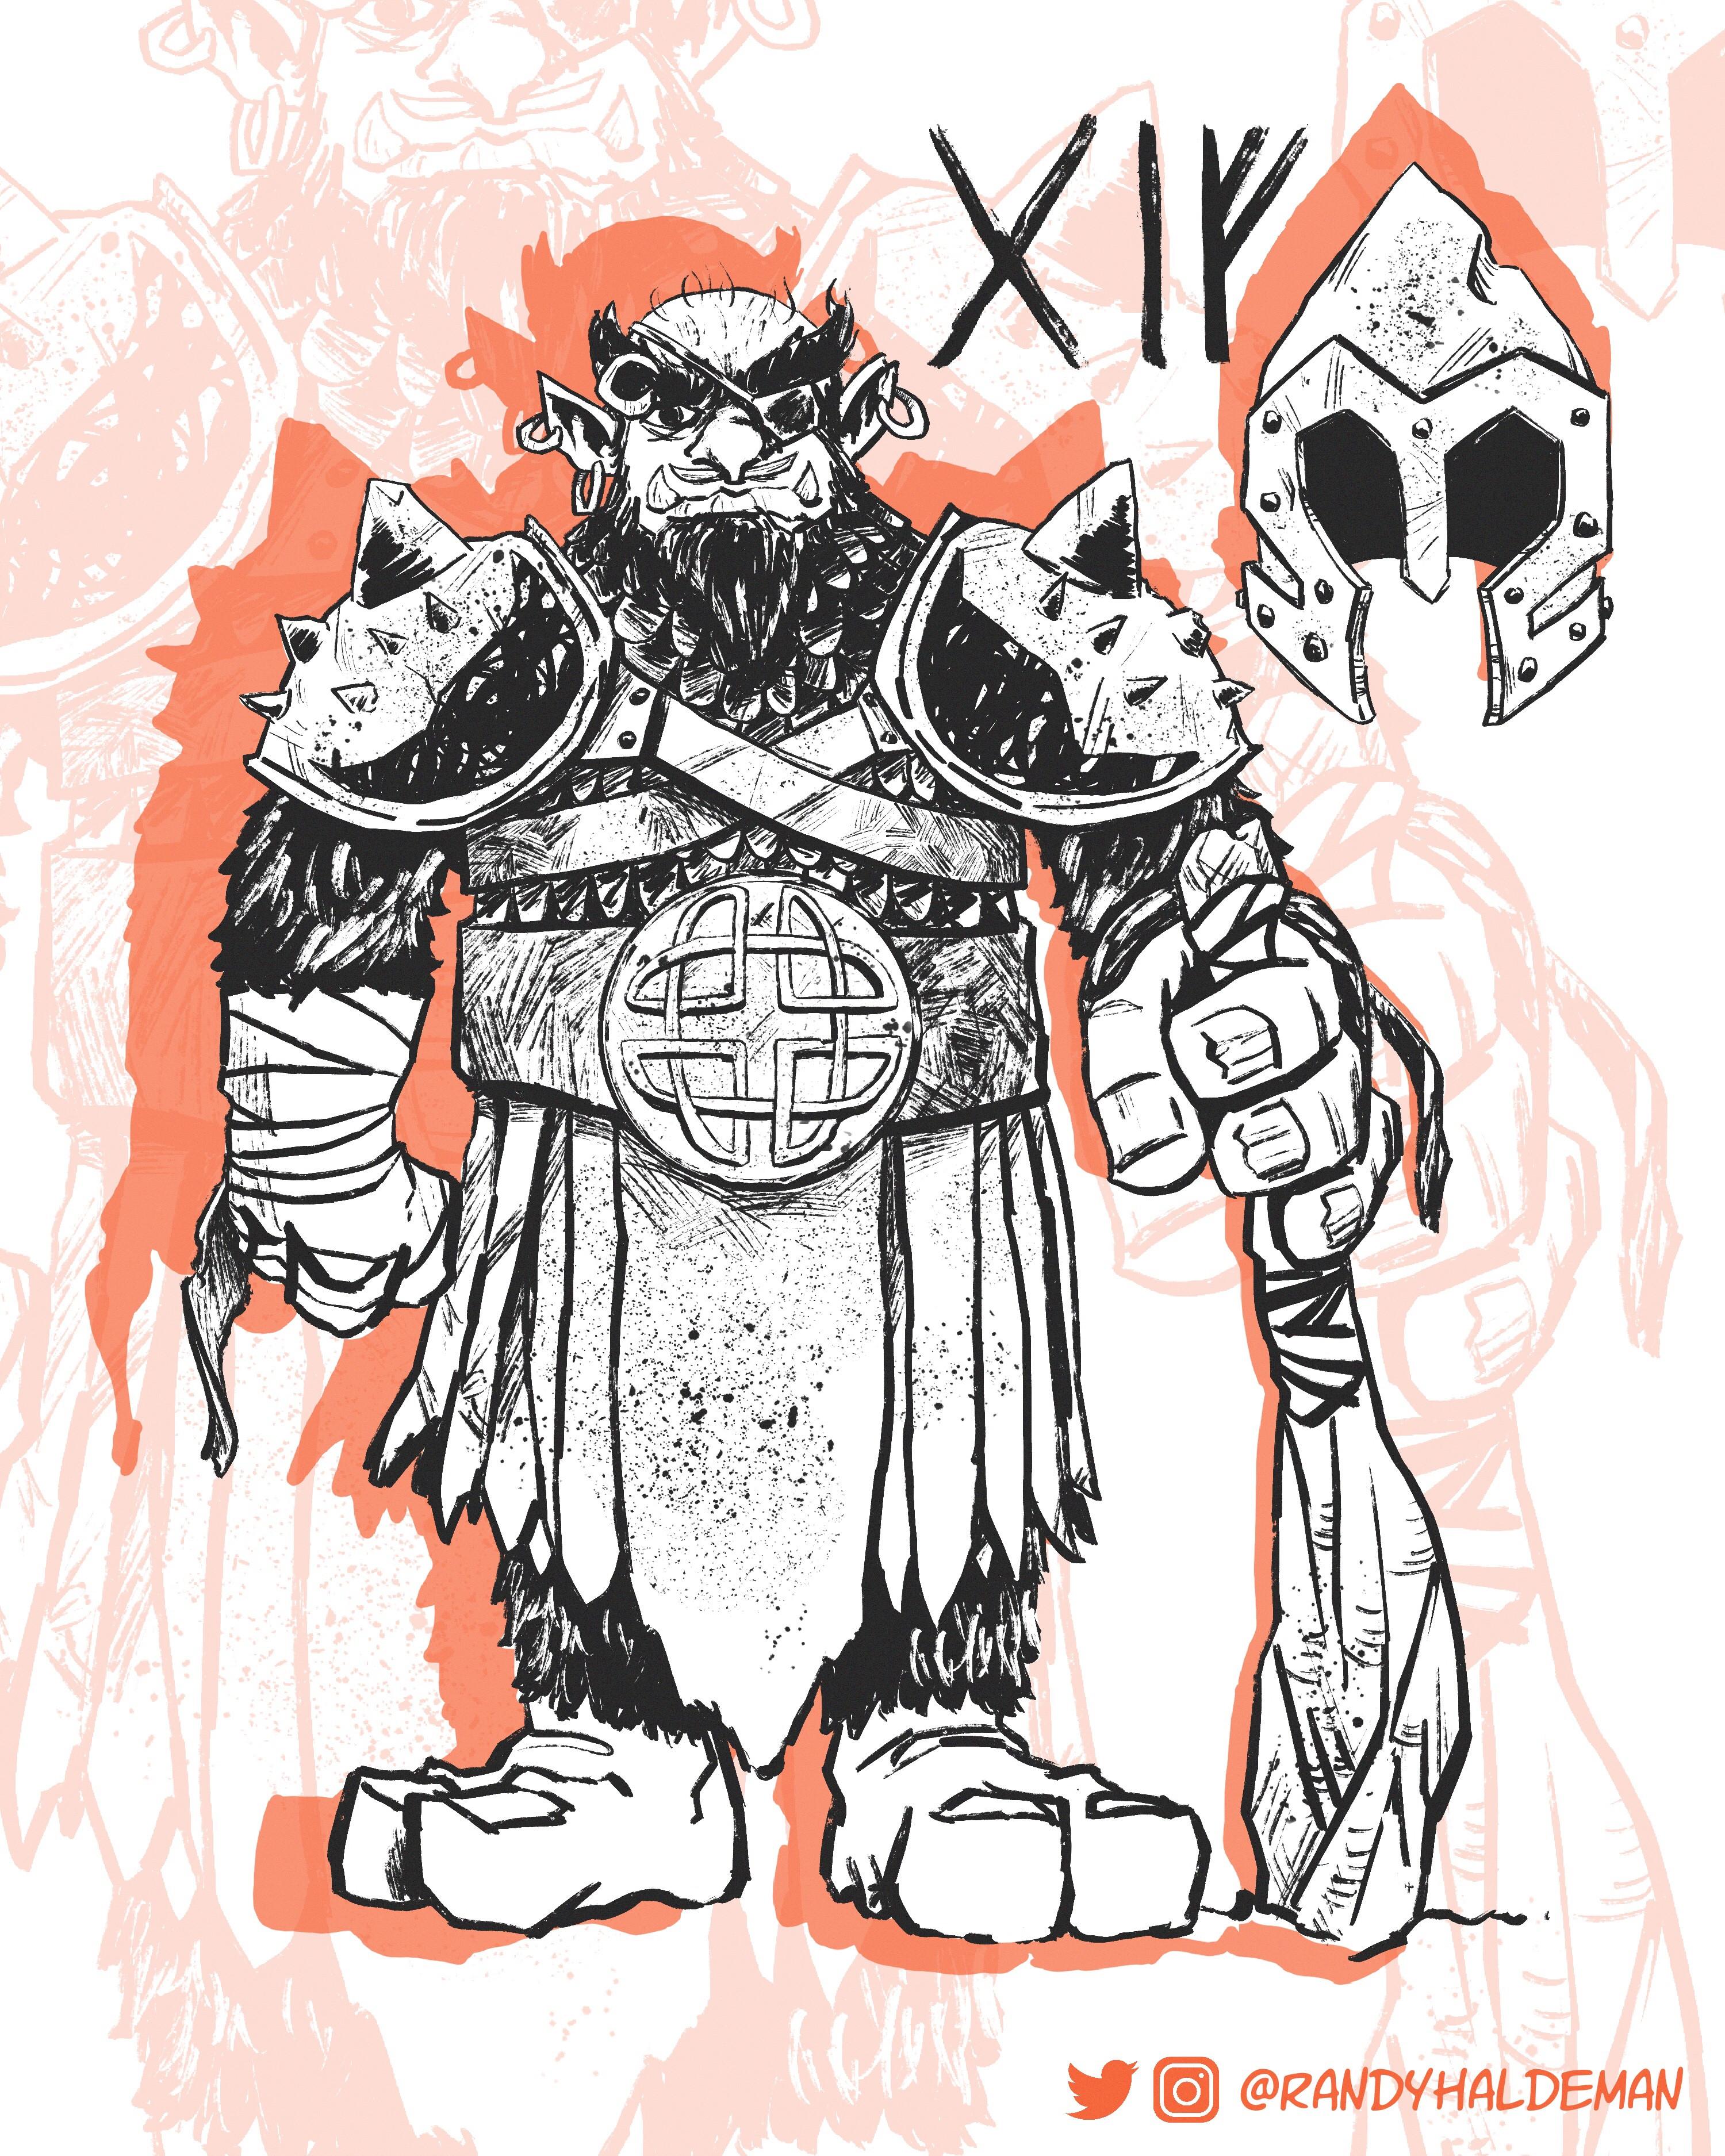 Gif, The Troll King.